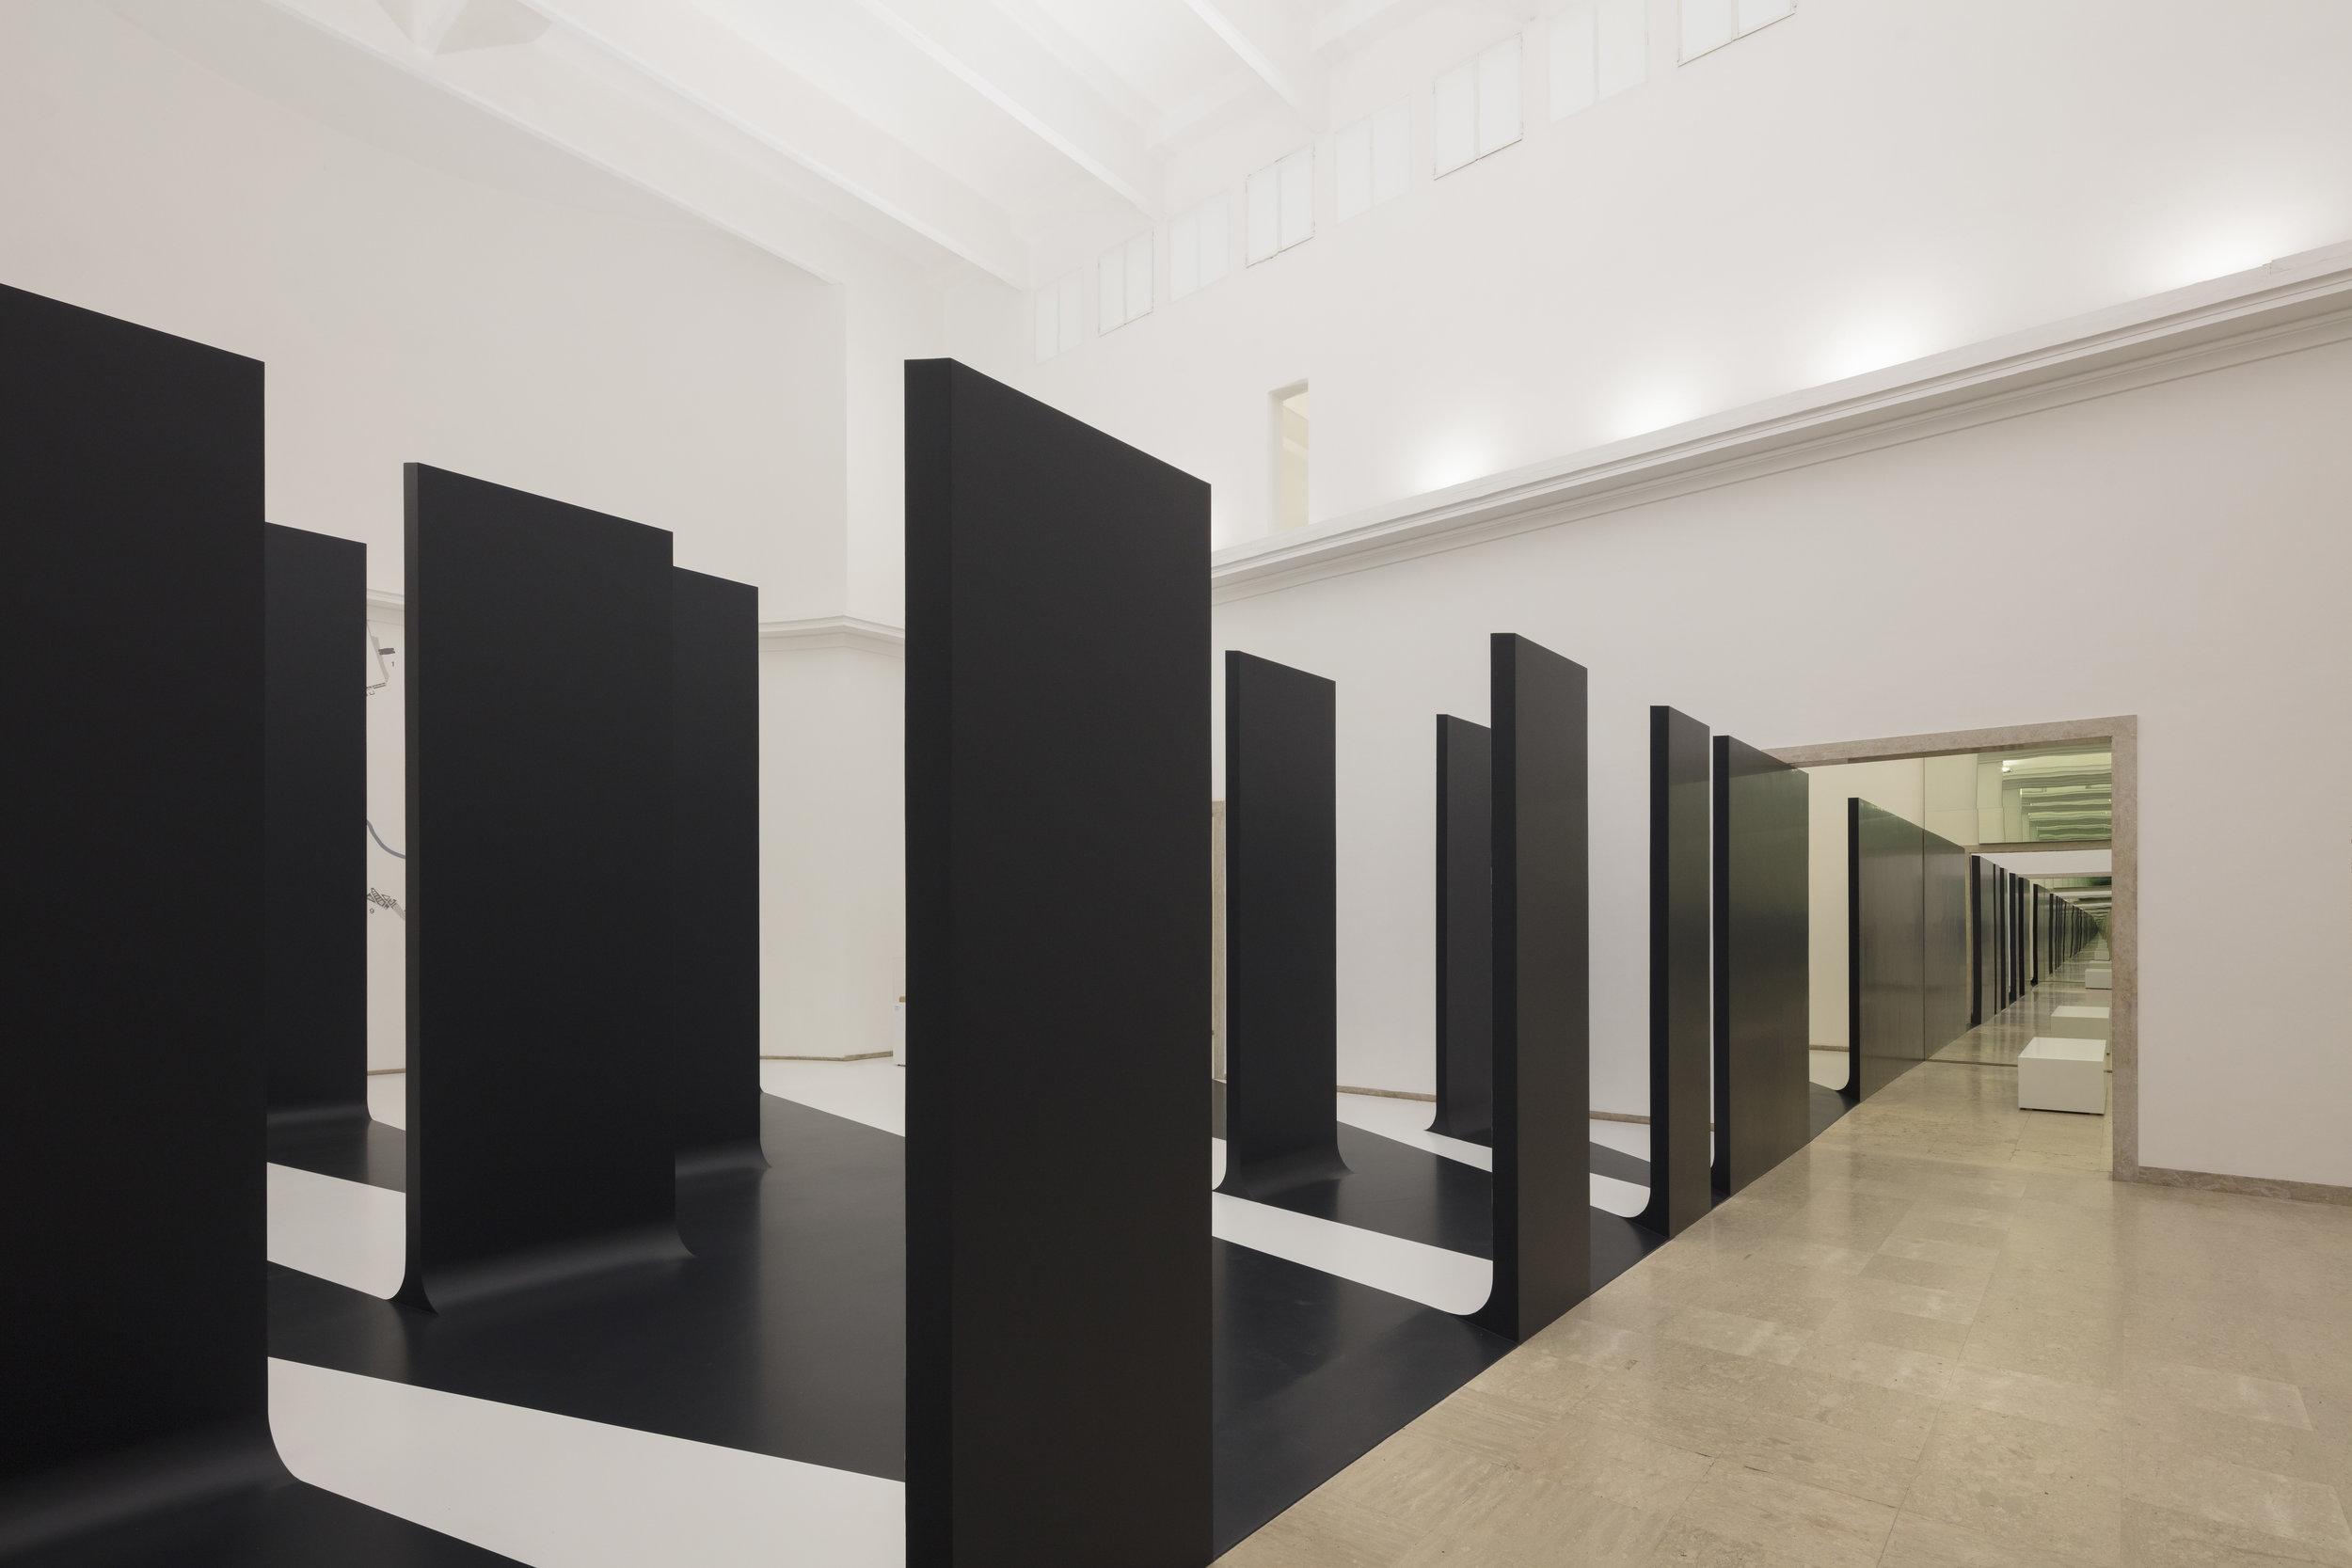 09_German Pavilion_Biennale Architettura 2018_c_Jan Bitter.jpg